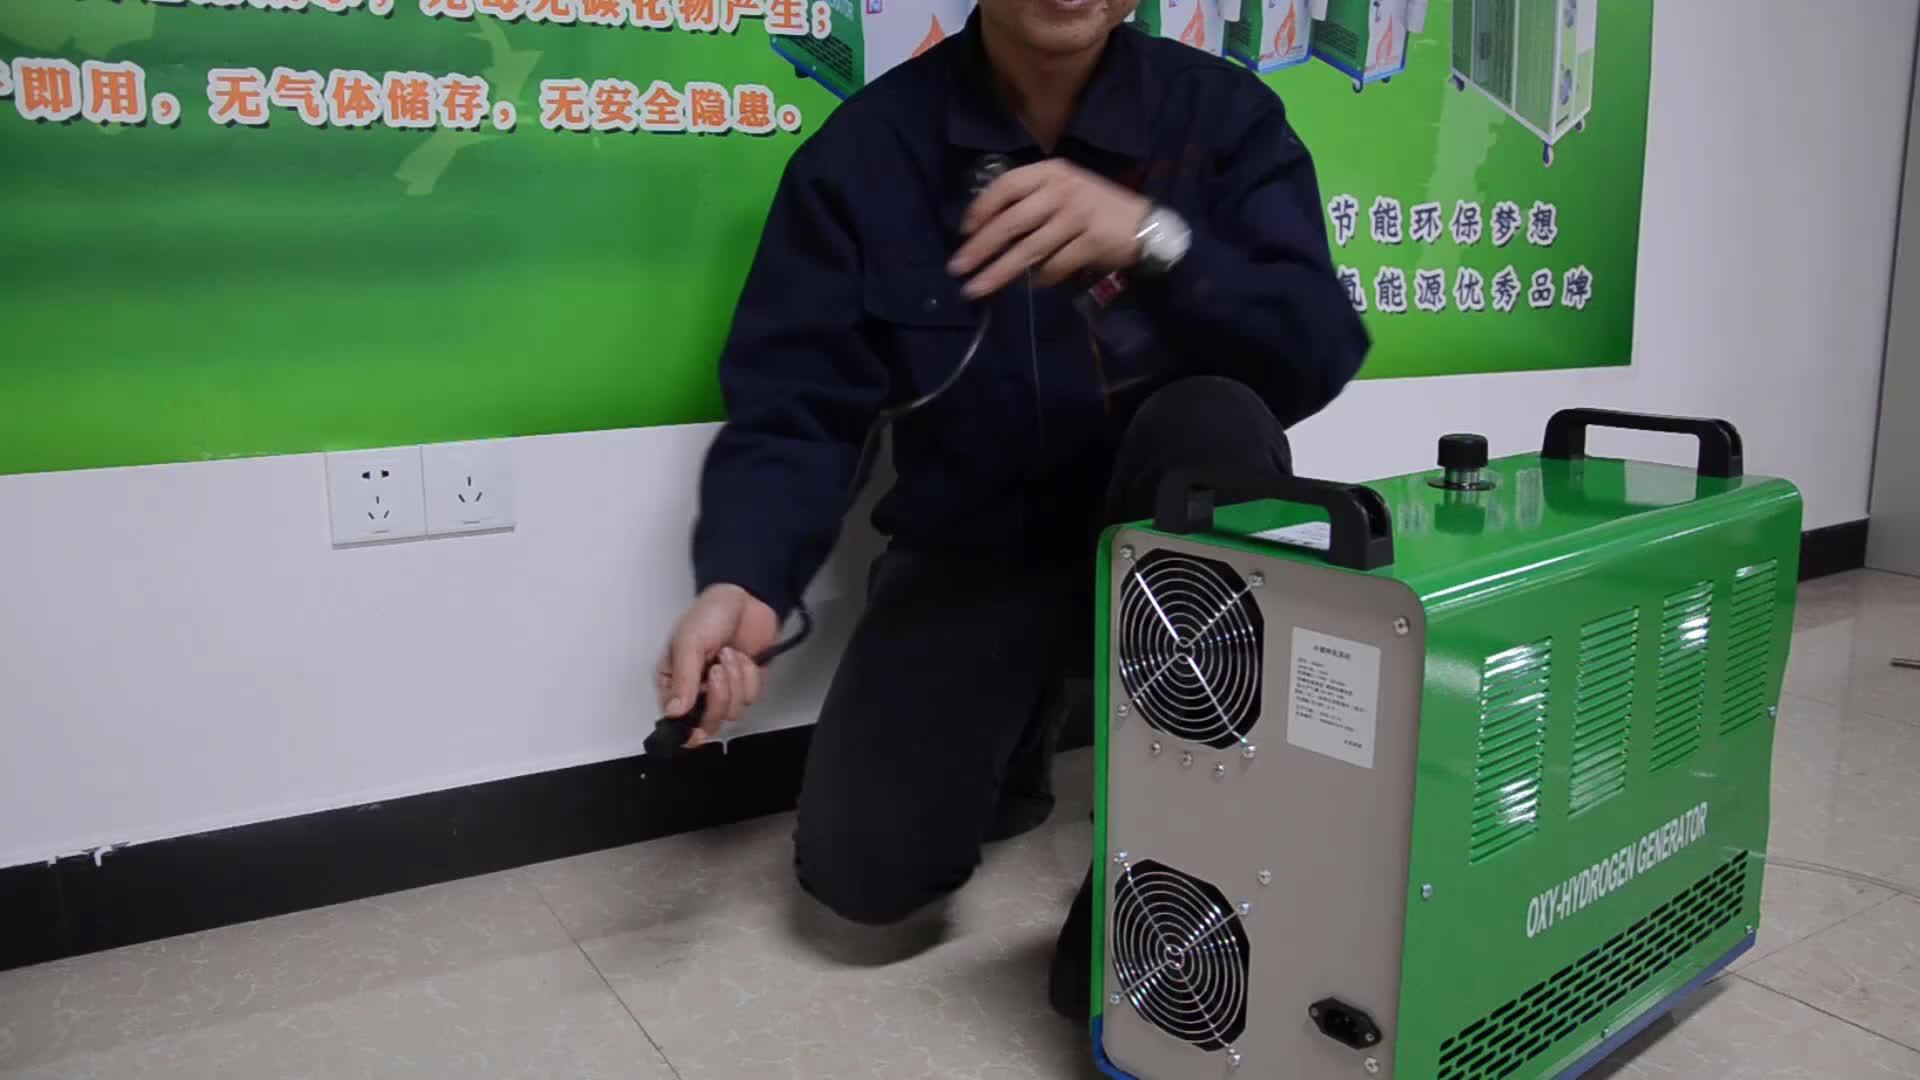 Trasporto libero di caldo-vendita bus camion barca 12/24V gas hho generatore di idrogeno hho kit per auto